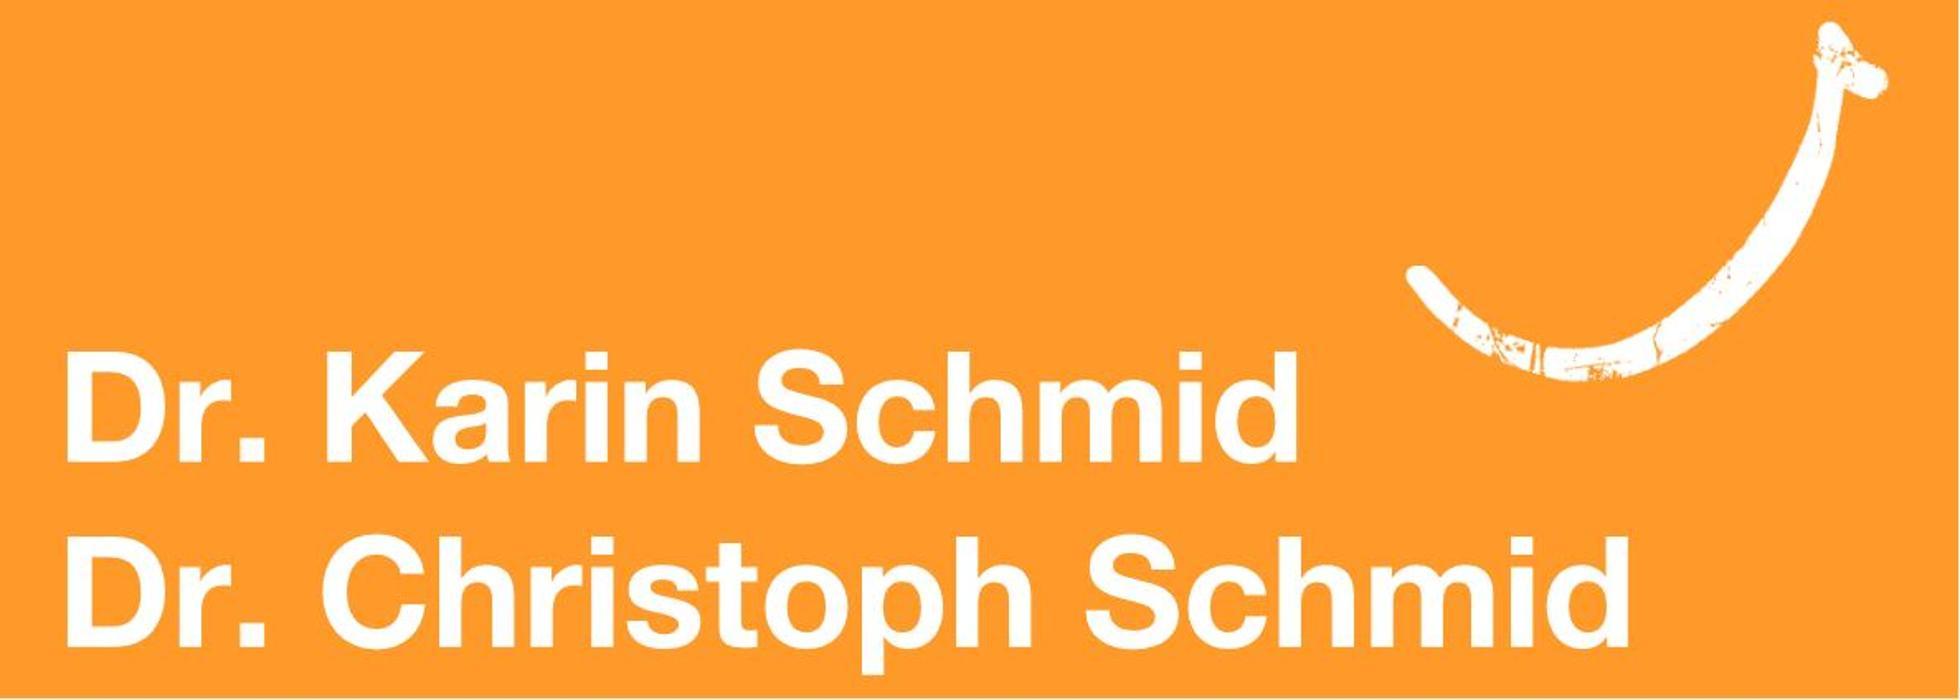 Bild zu Zahnarztpraxis Dr. Karin Schmid u. Dr. Christoph Schmid in Günzburg